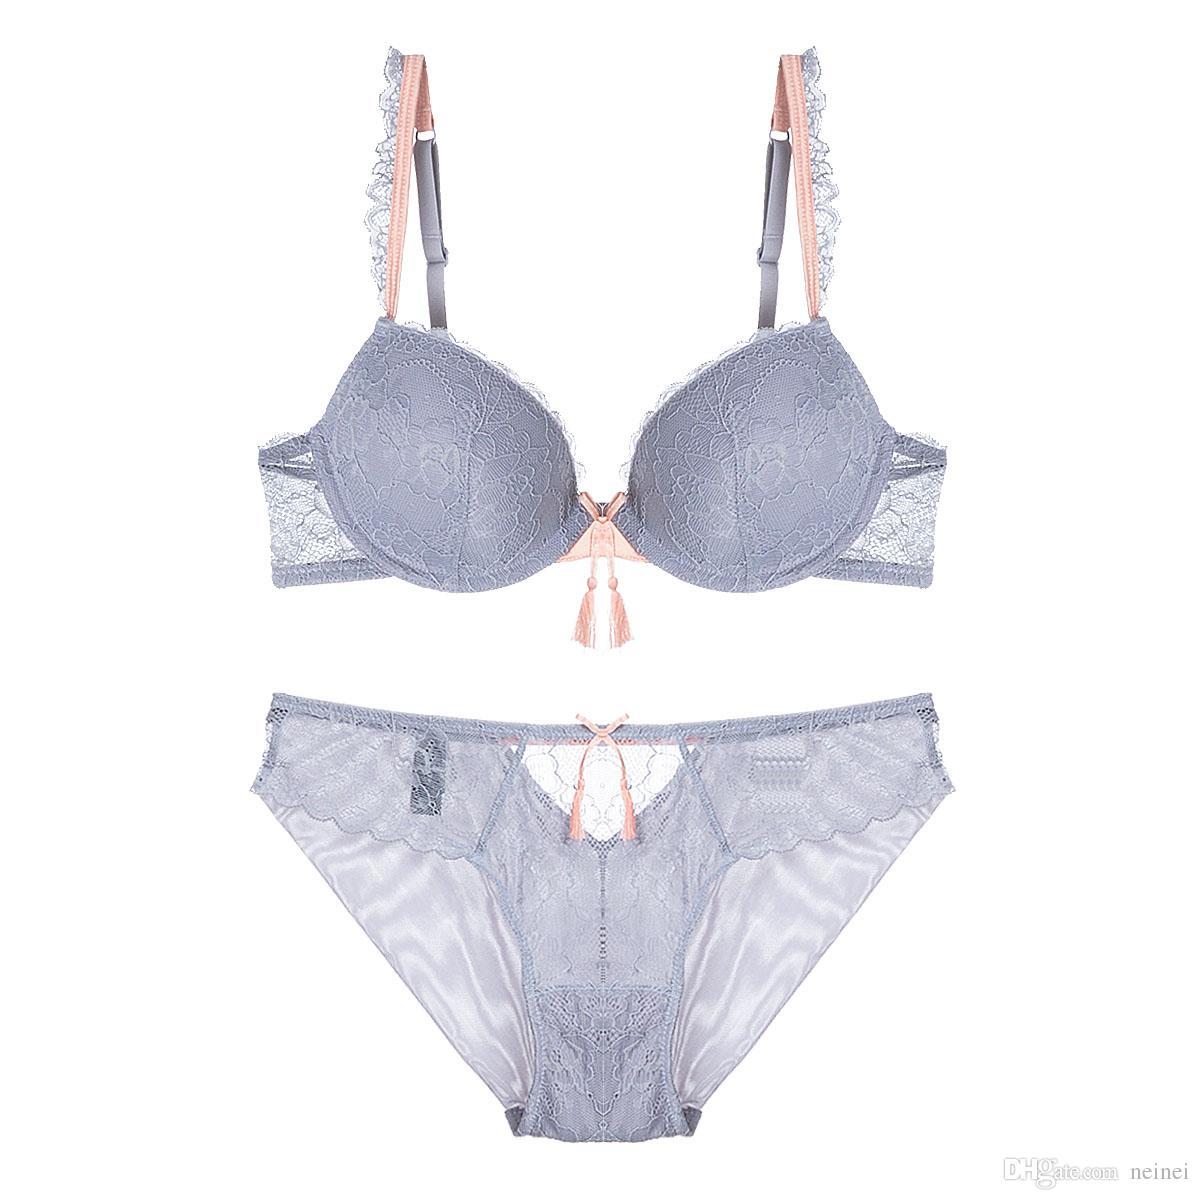 6ba8fa3526af5 New Lace Lingerie Bra Set Women Sexy Bra Set Push Up Bras Romantic ...